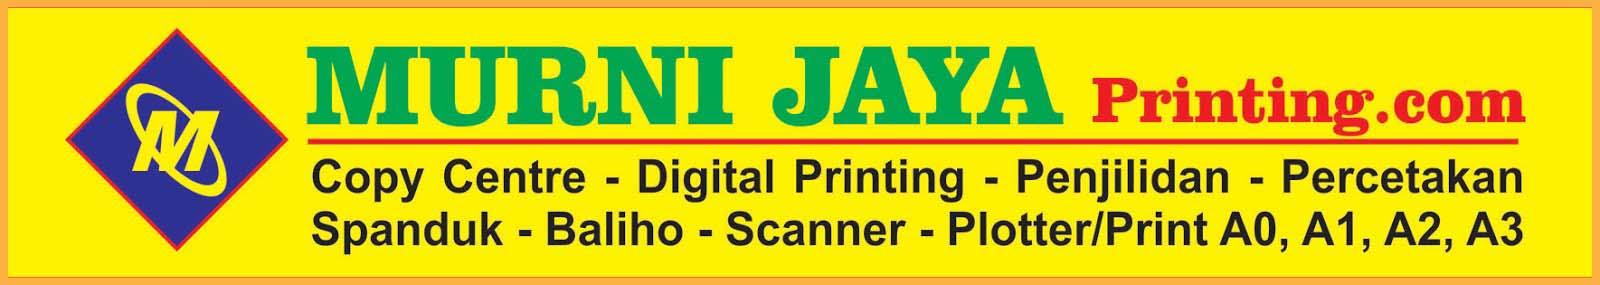 MURNI JAYA Printing » Jasa Fotocopy & Cetak Spanduk 24 Jam di Jakarta